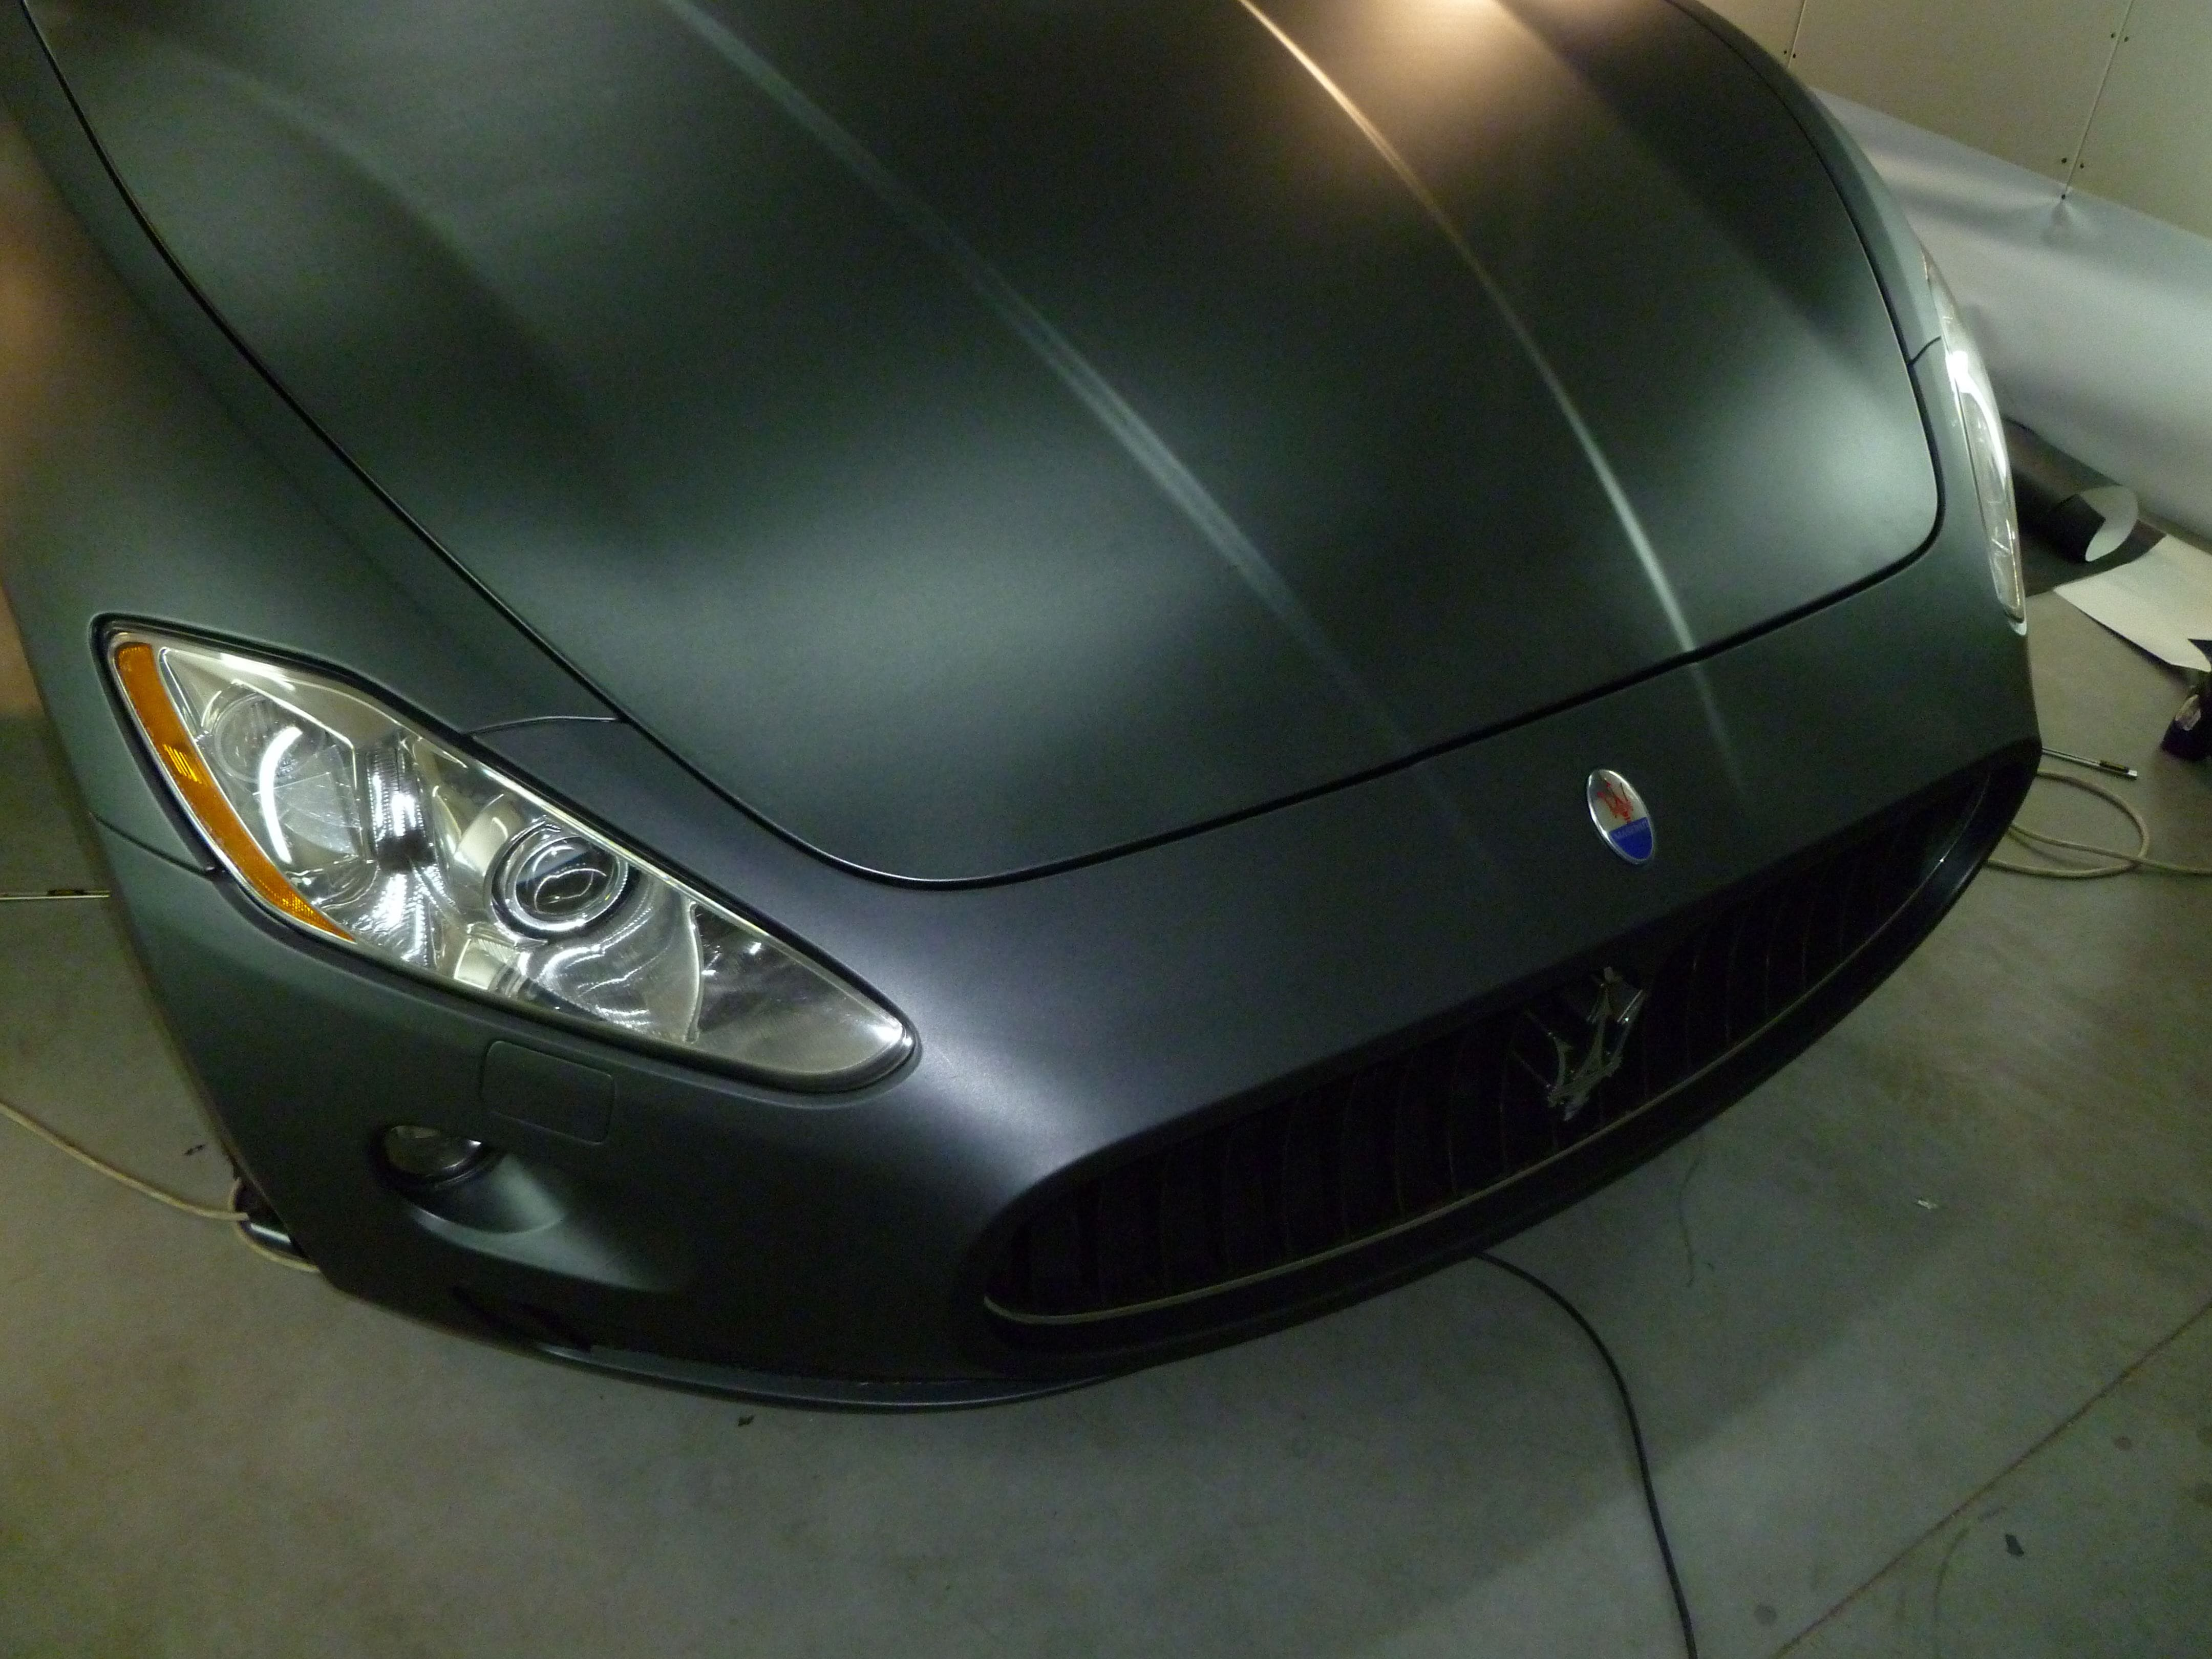 Maserati Gran Turismo met Mat Zwarte Wrap, Carwrapping door Wrapmyride.nu Foto-nr:6060, ©2020